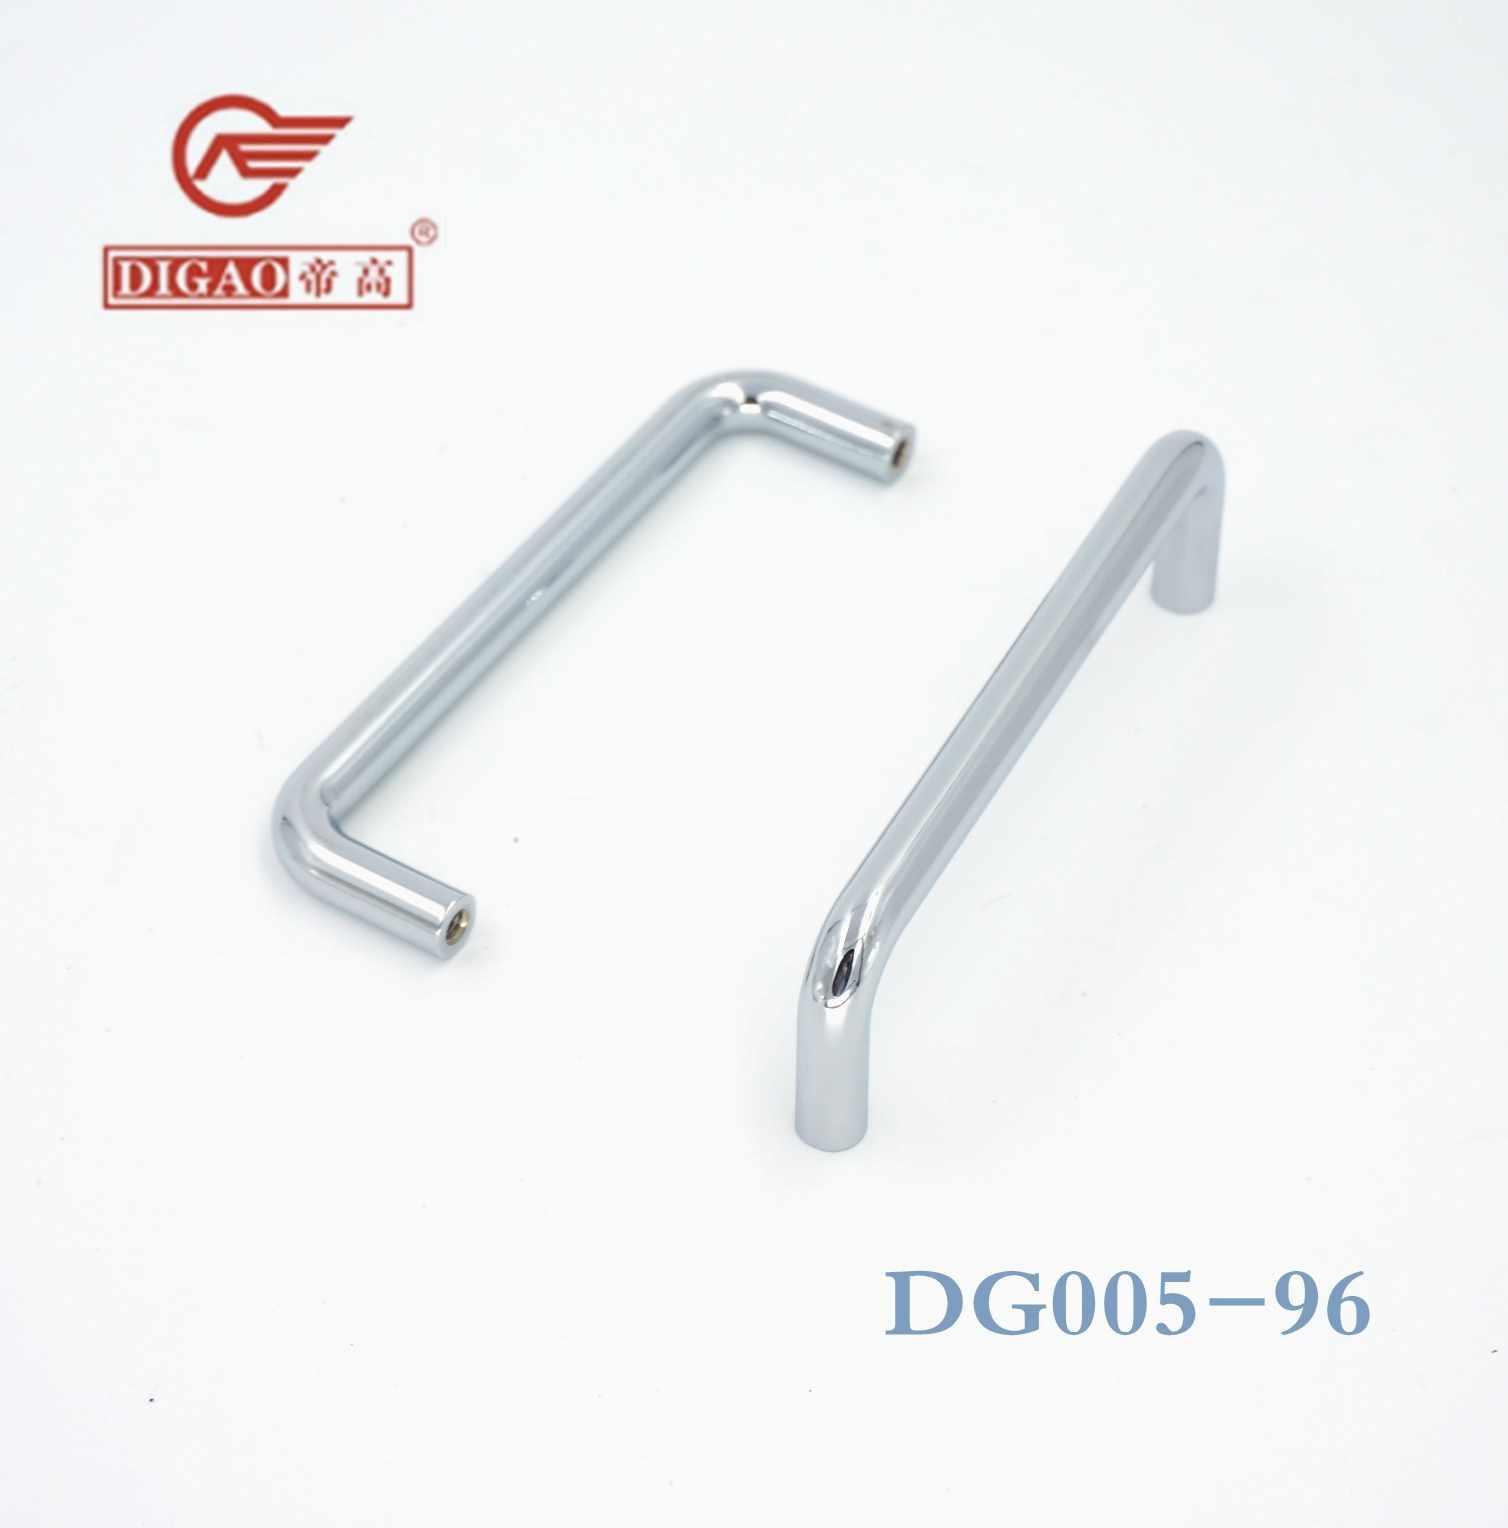 DG005-96